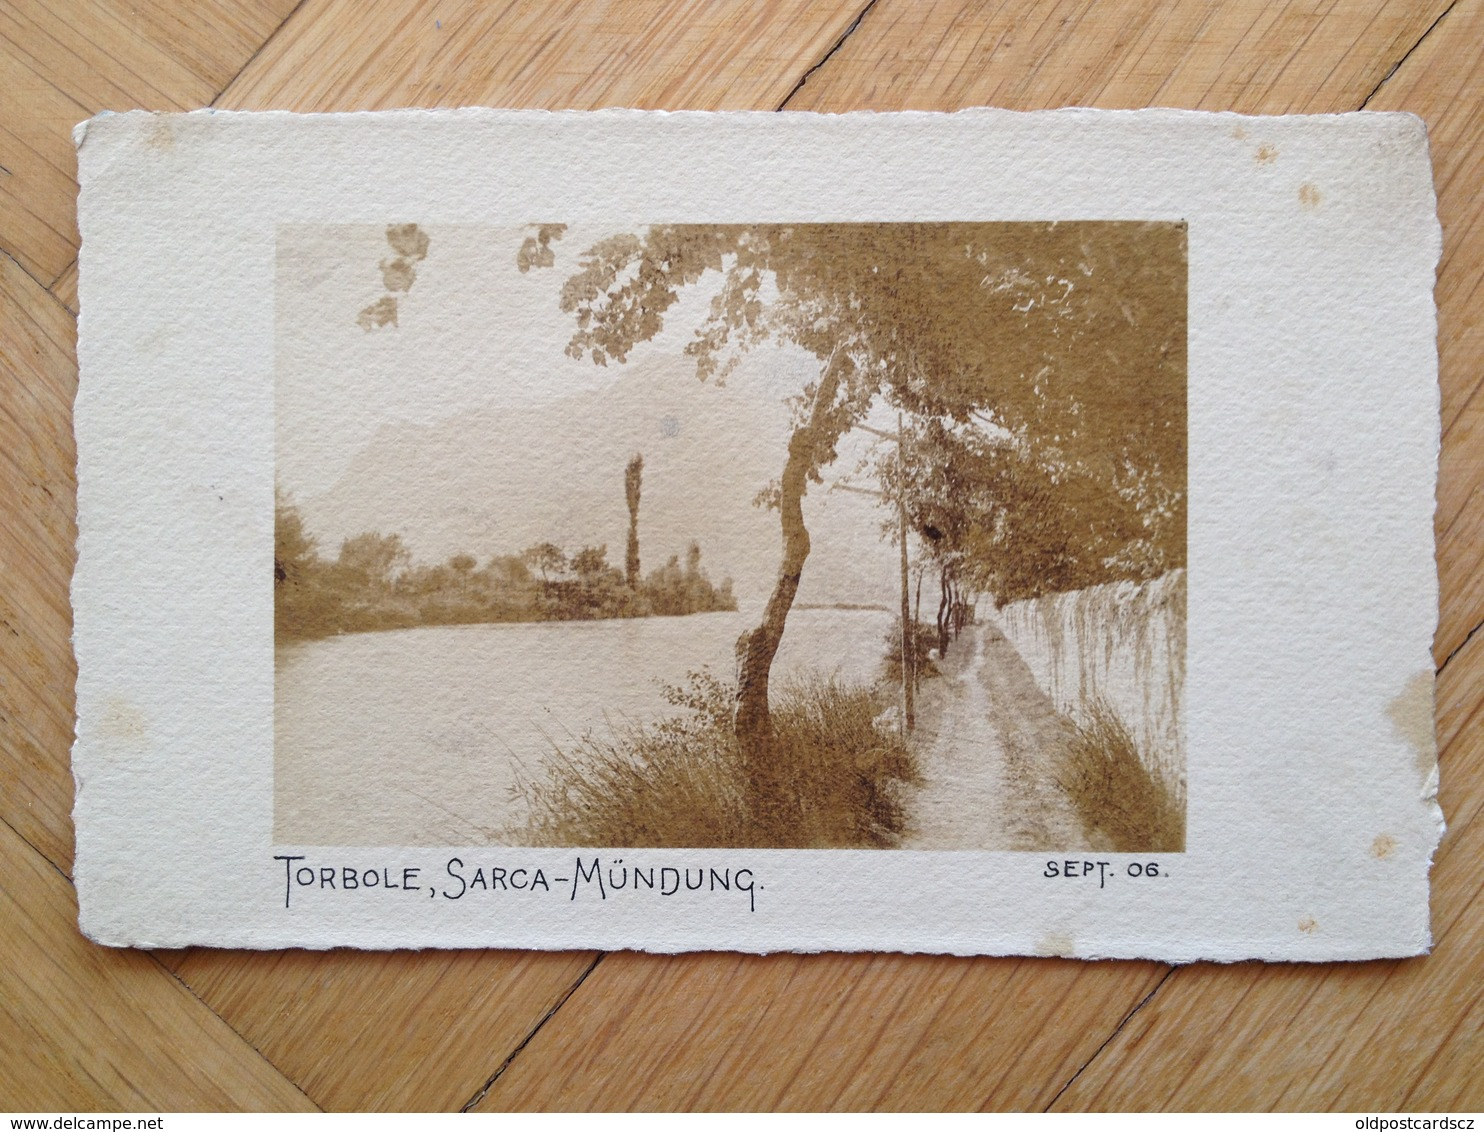 TN 3063 Lago Di Garda Torbole 1906 Sarca Mundung Photo - Italia